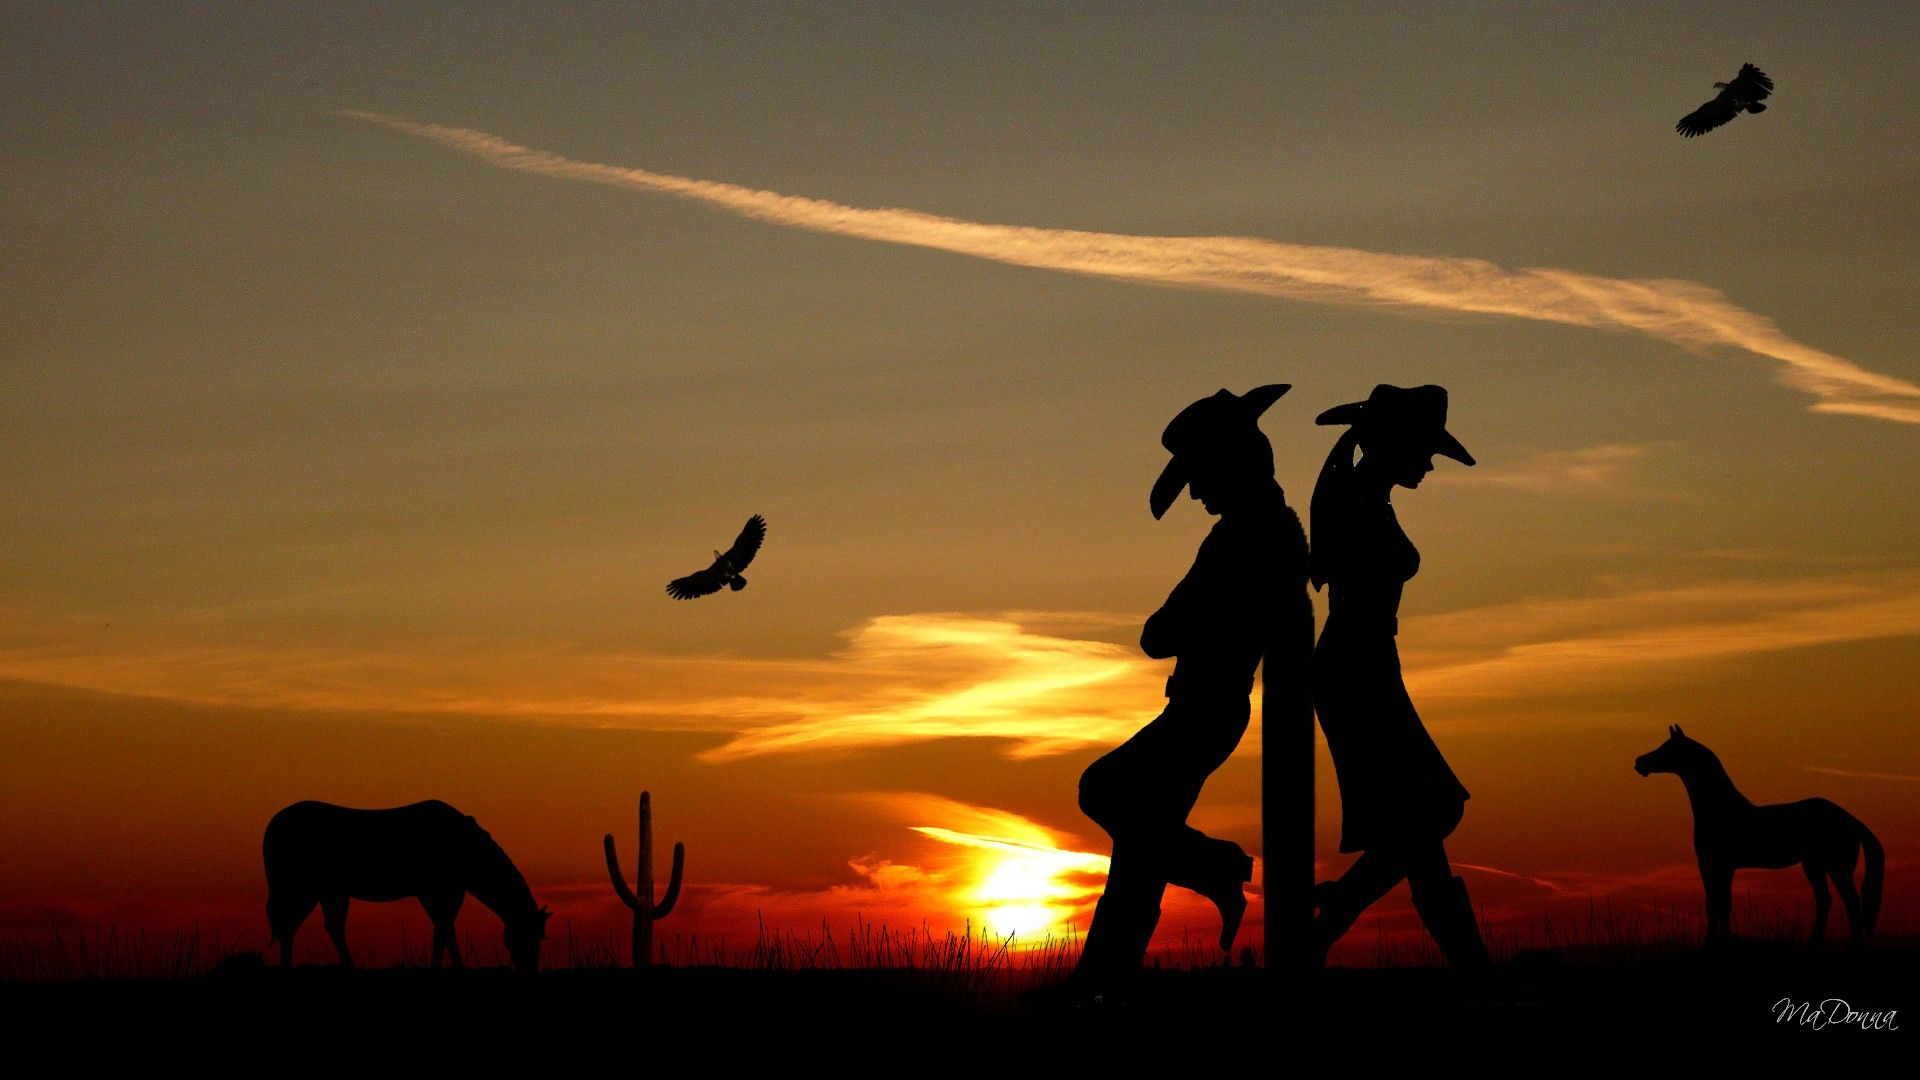 western cowboys | cactus cowboy western romance wallpaper | cards